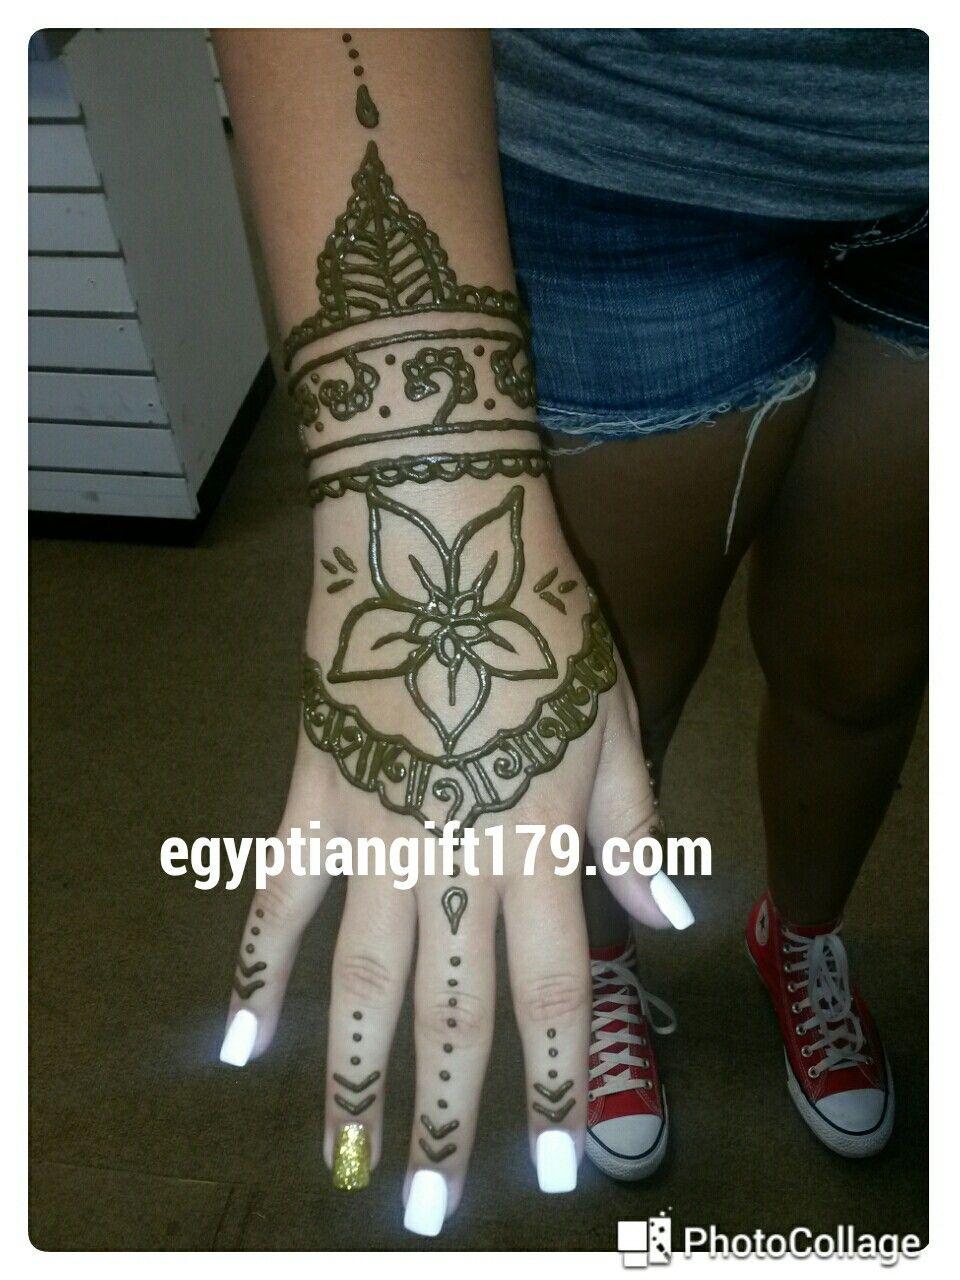 Egyptian gift corner henna shop henna tattoo henna